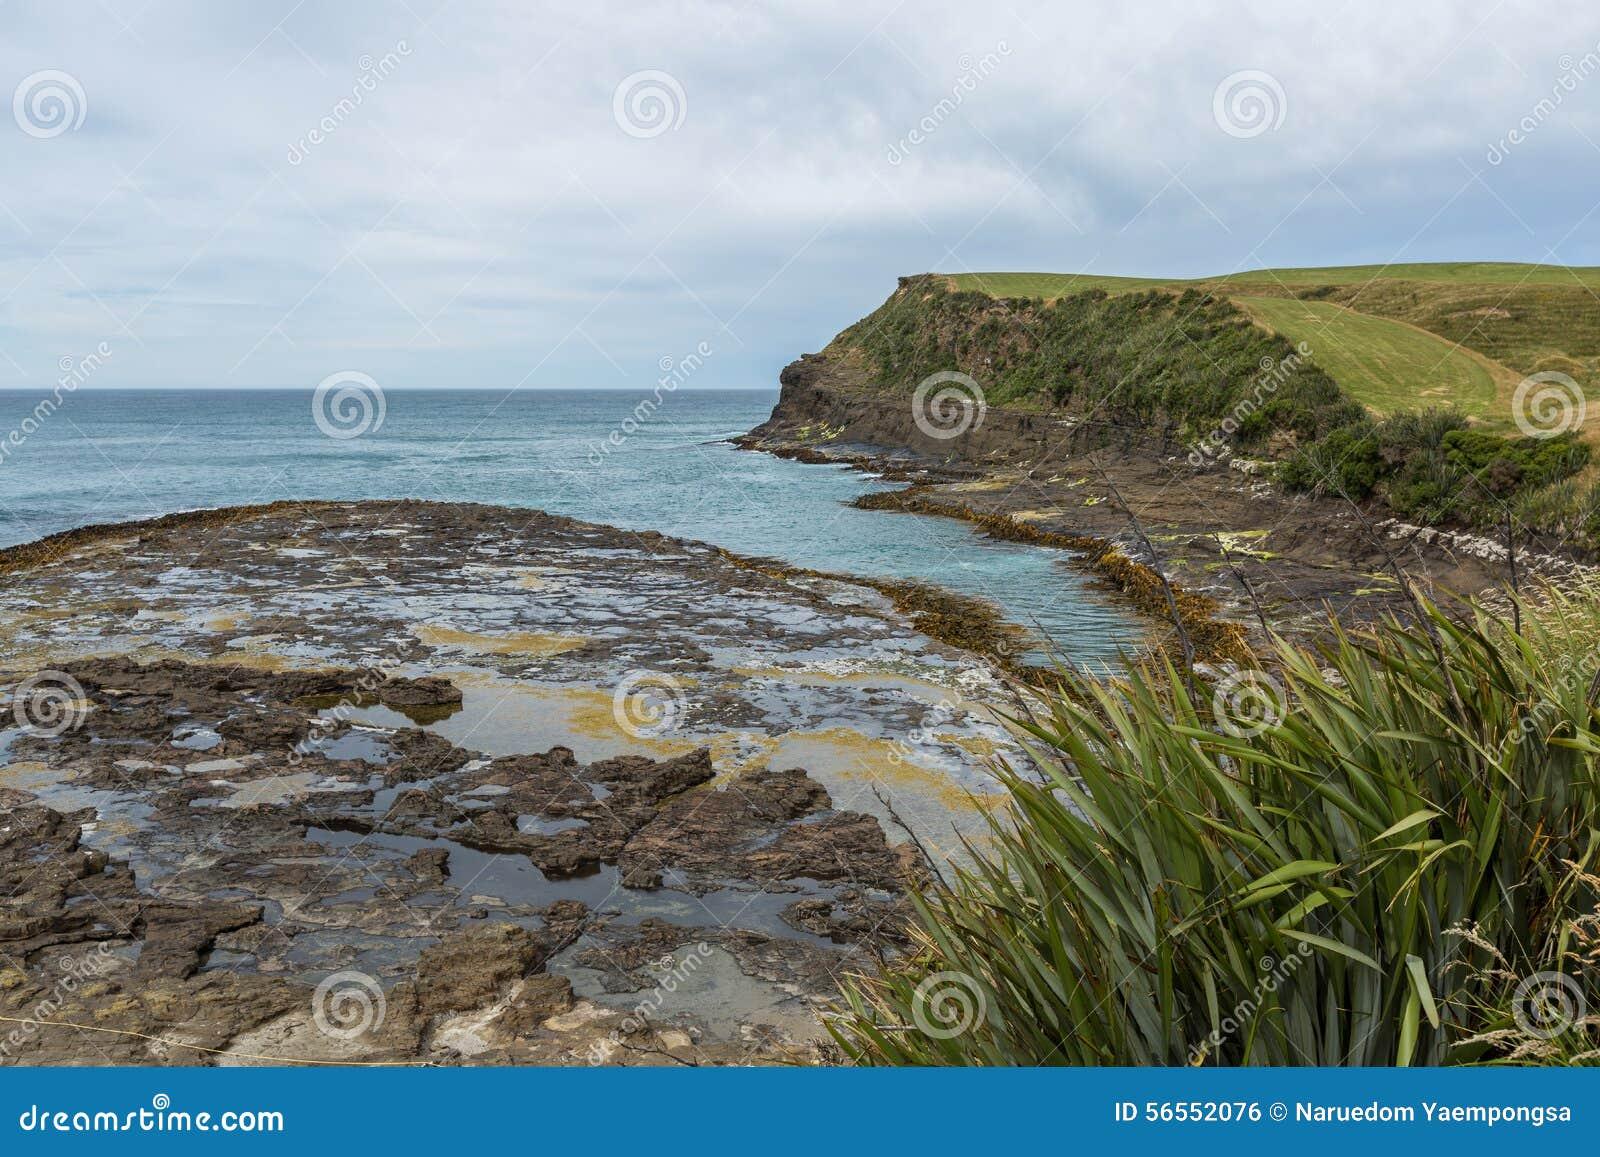 Download Κόλπος τιμαλφών αντικειμένων, το Catlins Νέα Ζηλανδία Στοκ Εικόνες - εικόνα από southland, curio: 56552076